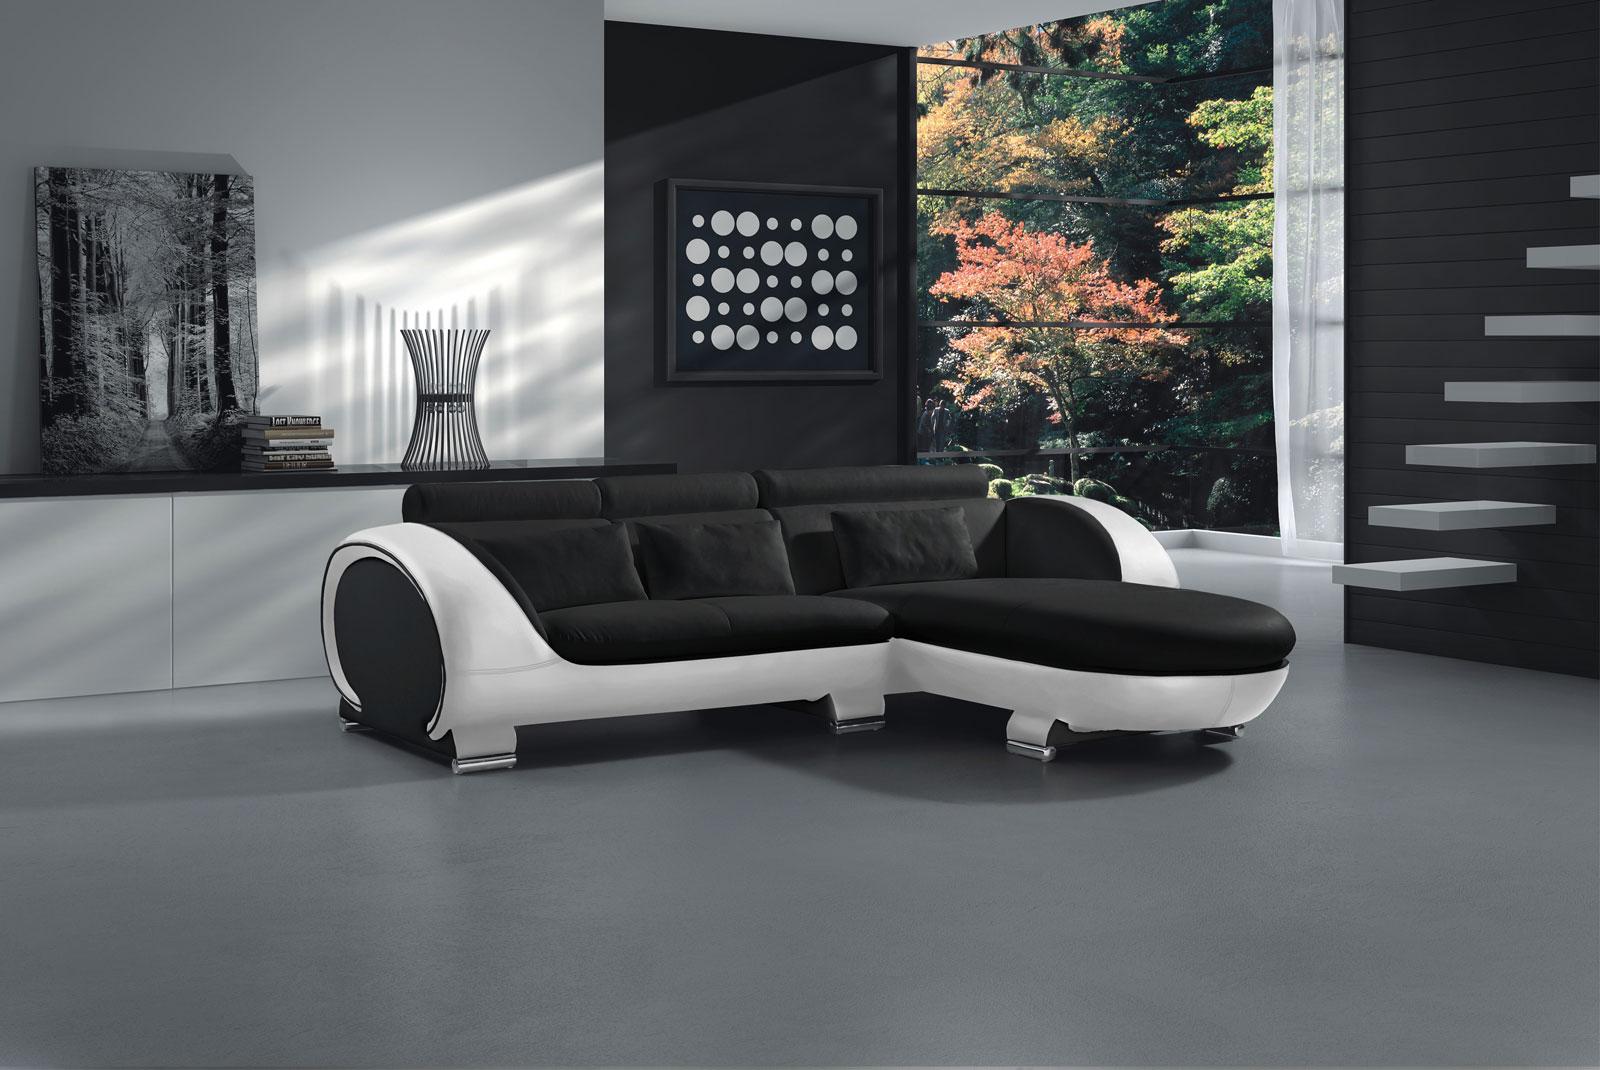 sam sofa schwarz wei vigo combi 1 couch 242 x 181 cm demn chst. Black Bedroom Furniture Sets. Home Design Ideas